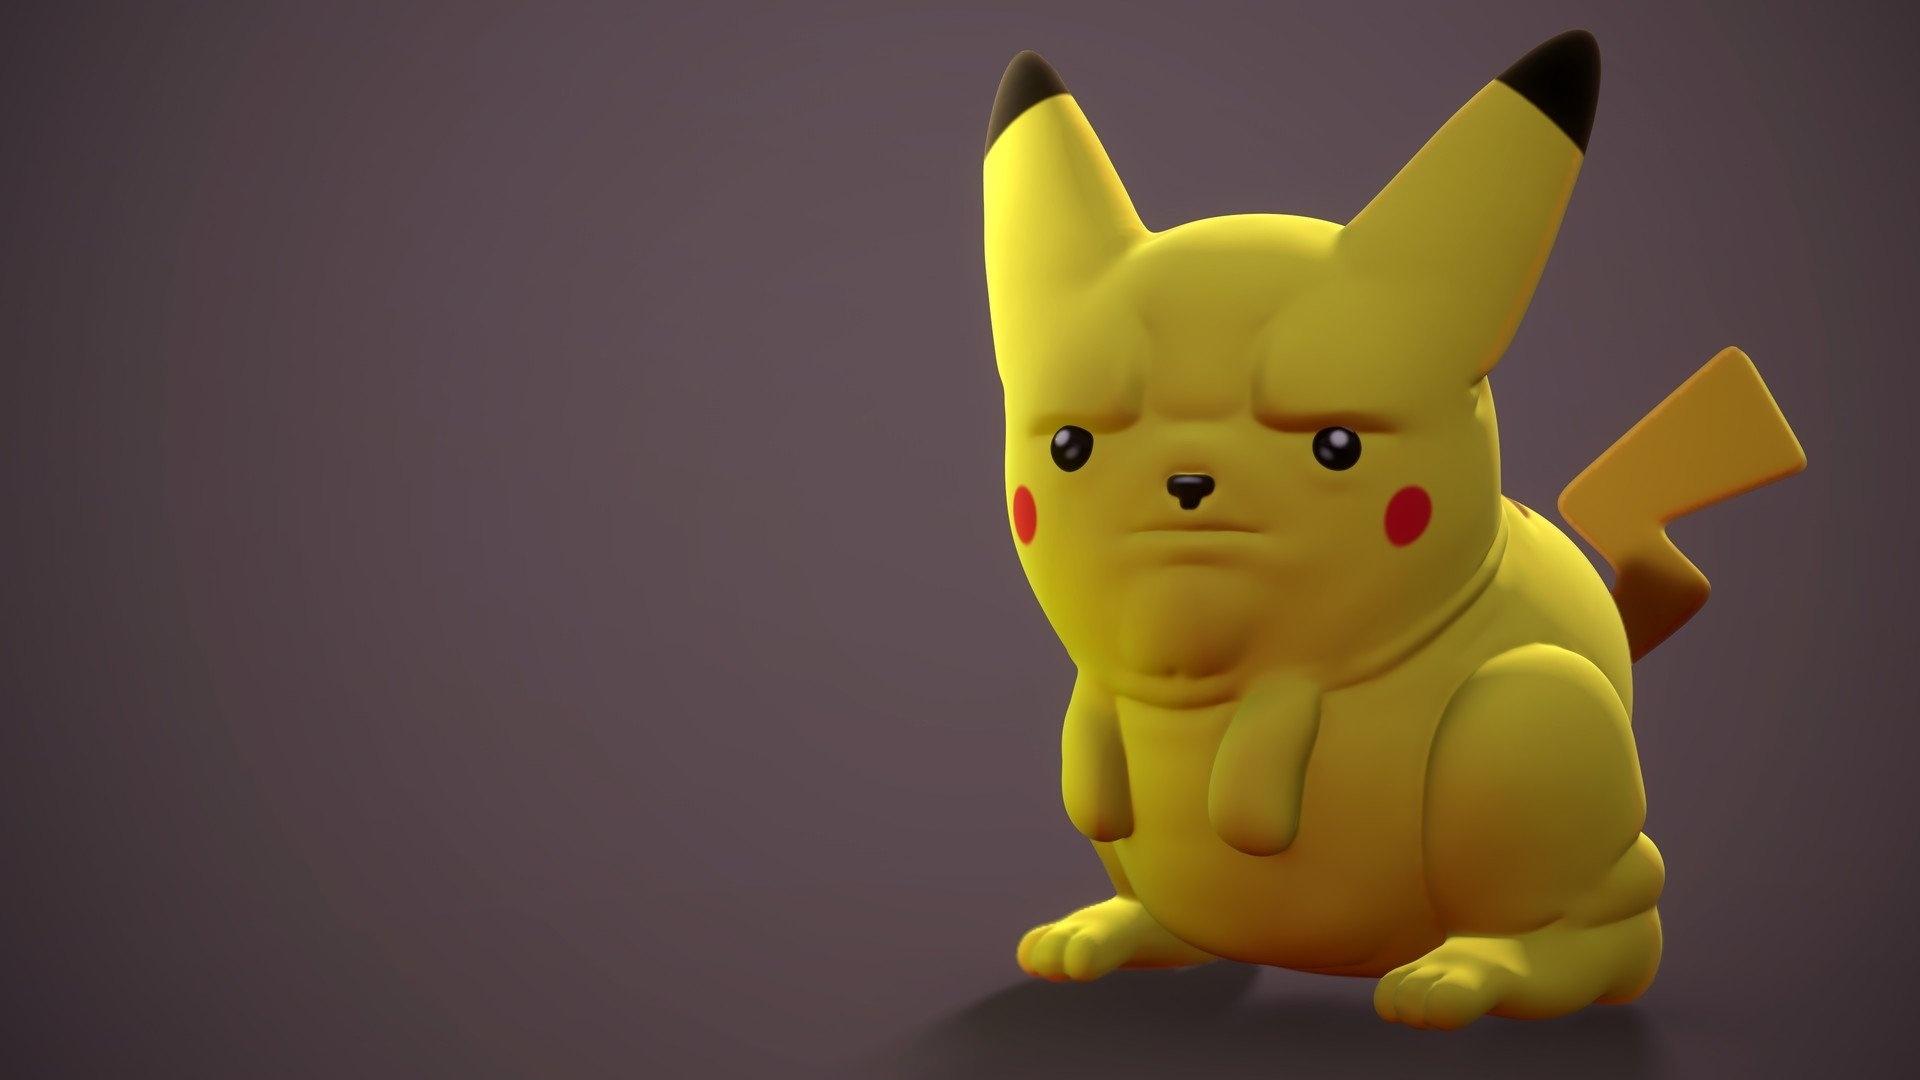 Pikachu free image